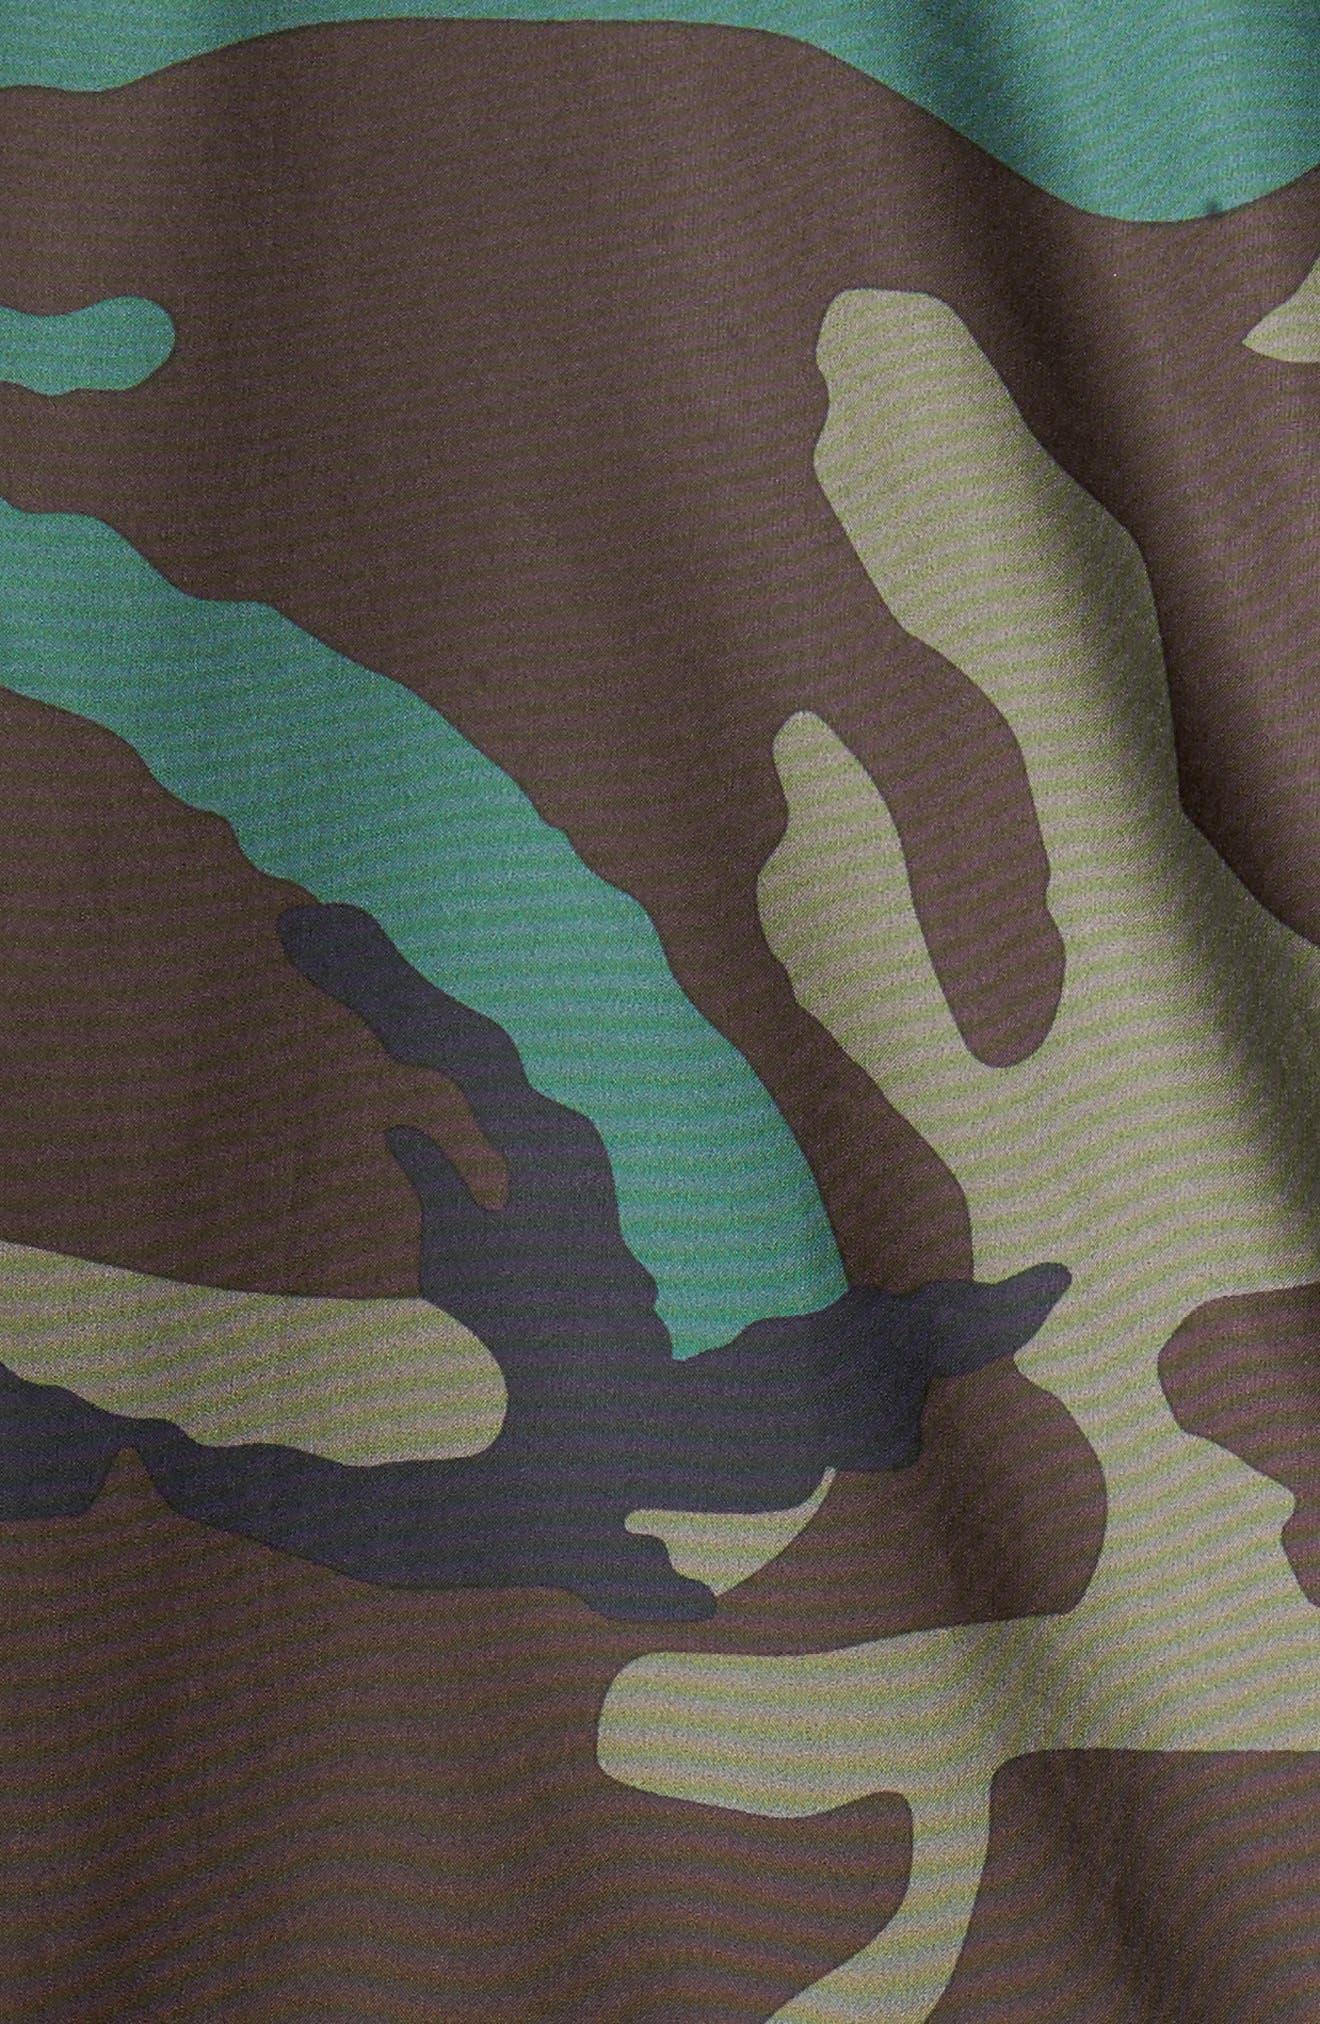 Shield Coach's Jacket,                             Alternate thumbnail 5, color,                             Medium Olive/ Black